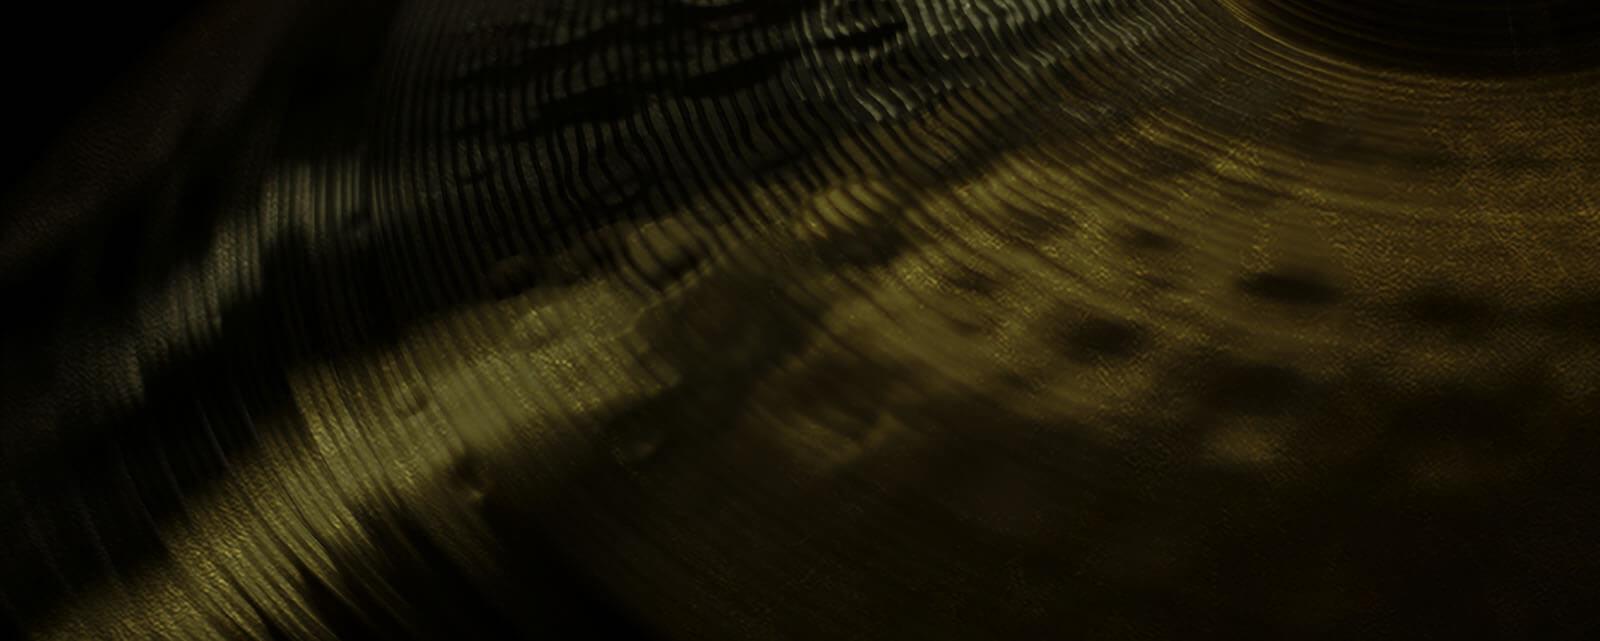 cymbal-pro1.jpg